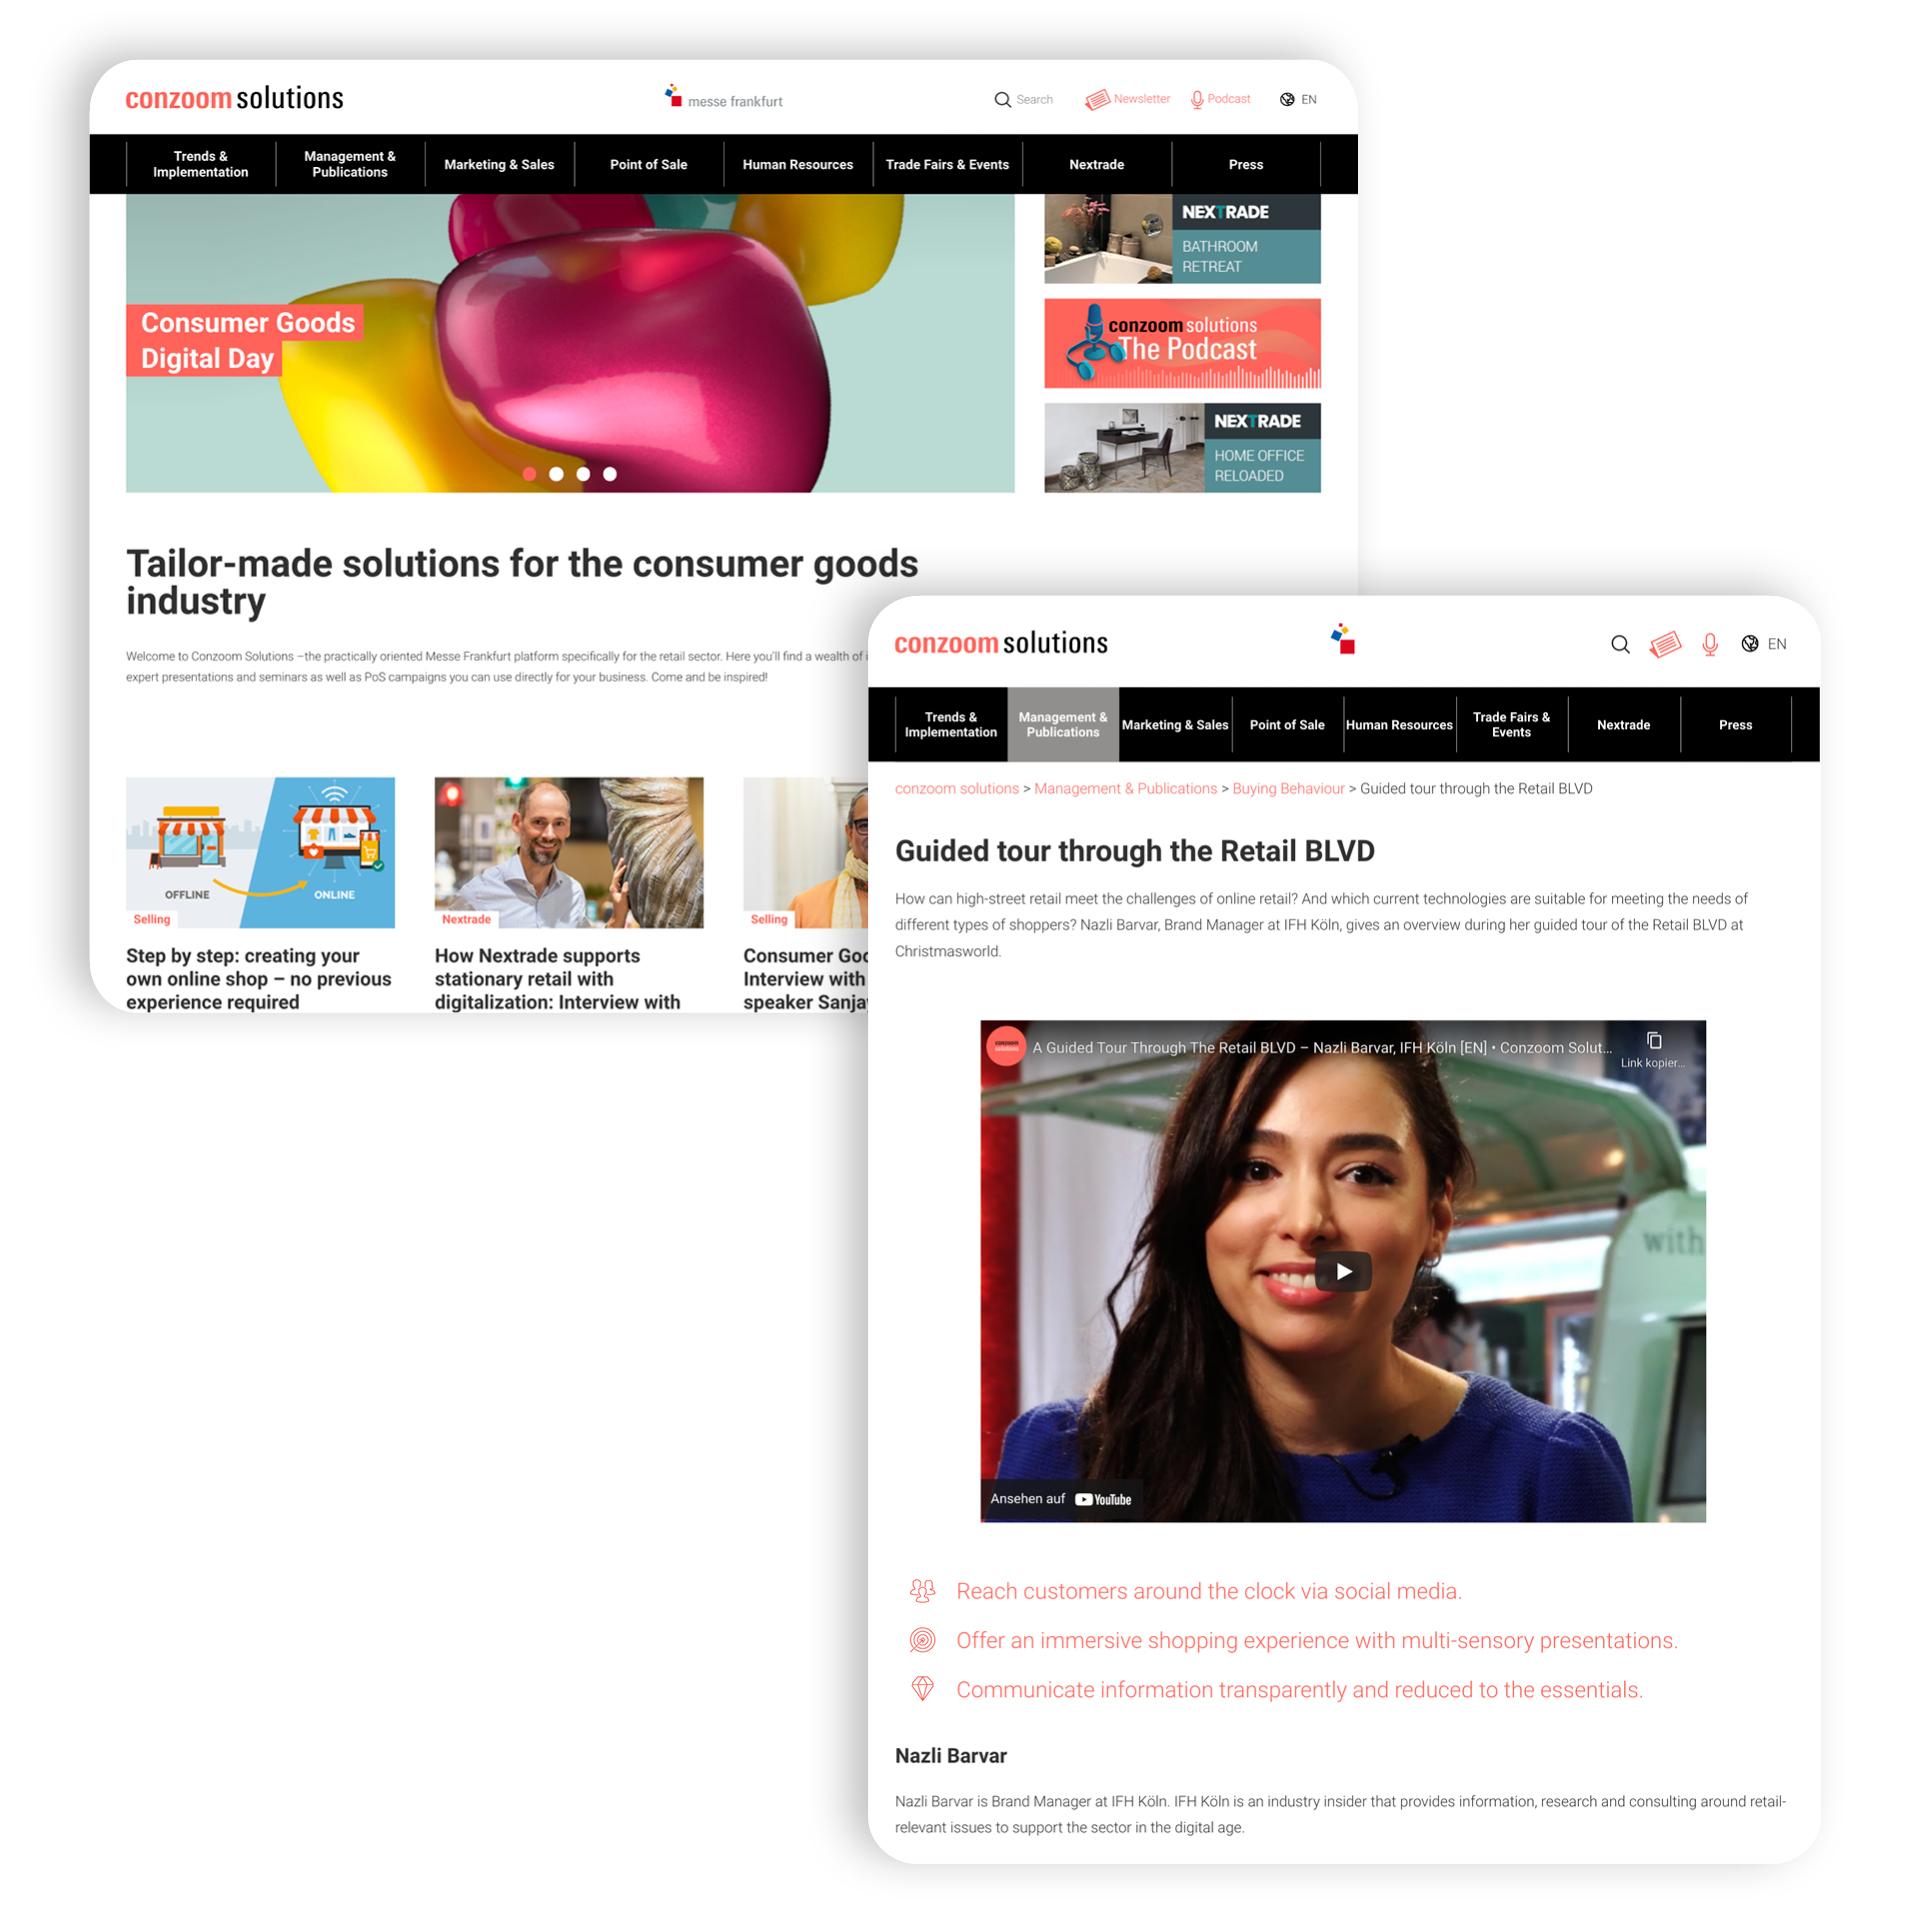 Screenshots of the WordPress website of conzoom solutions